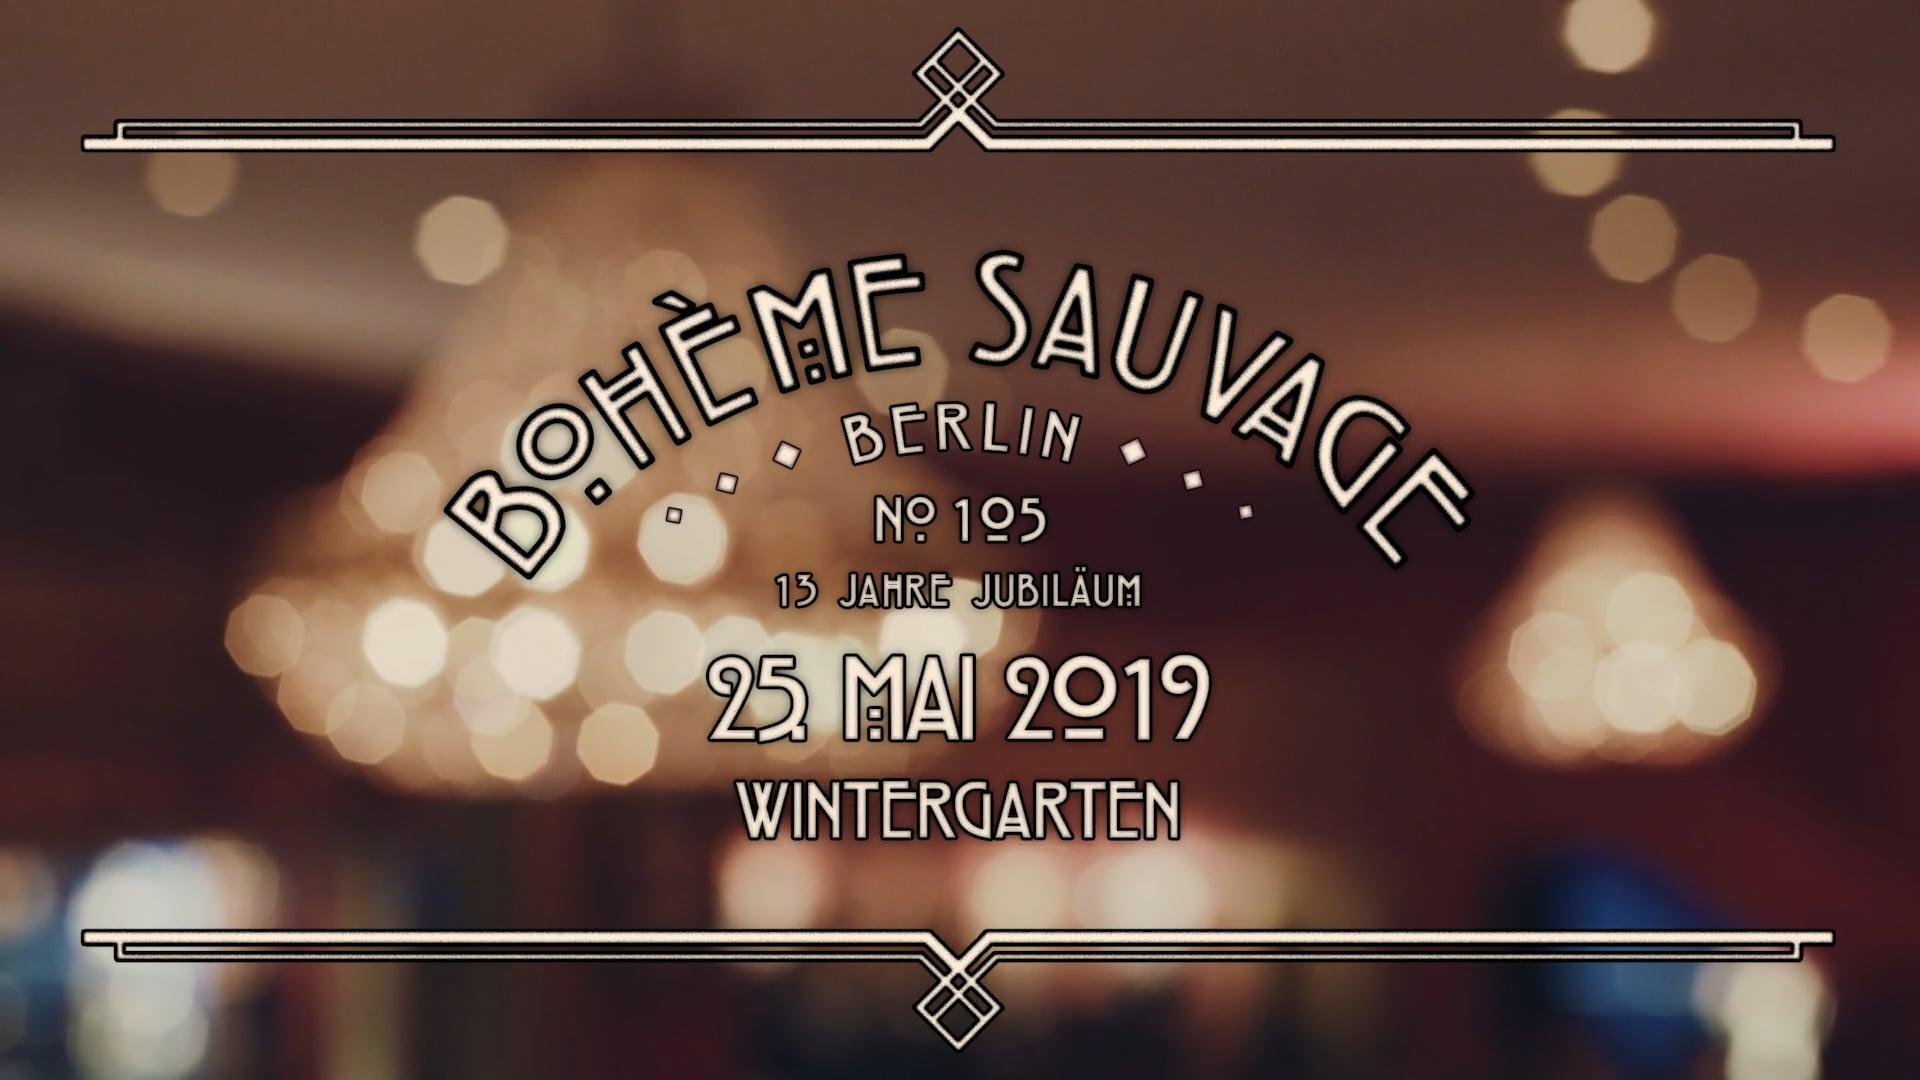 Bohème Sauvage Berlin Nº105 - 25. Mai 2019 - Wintergarten